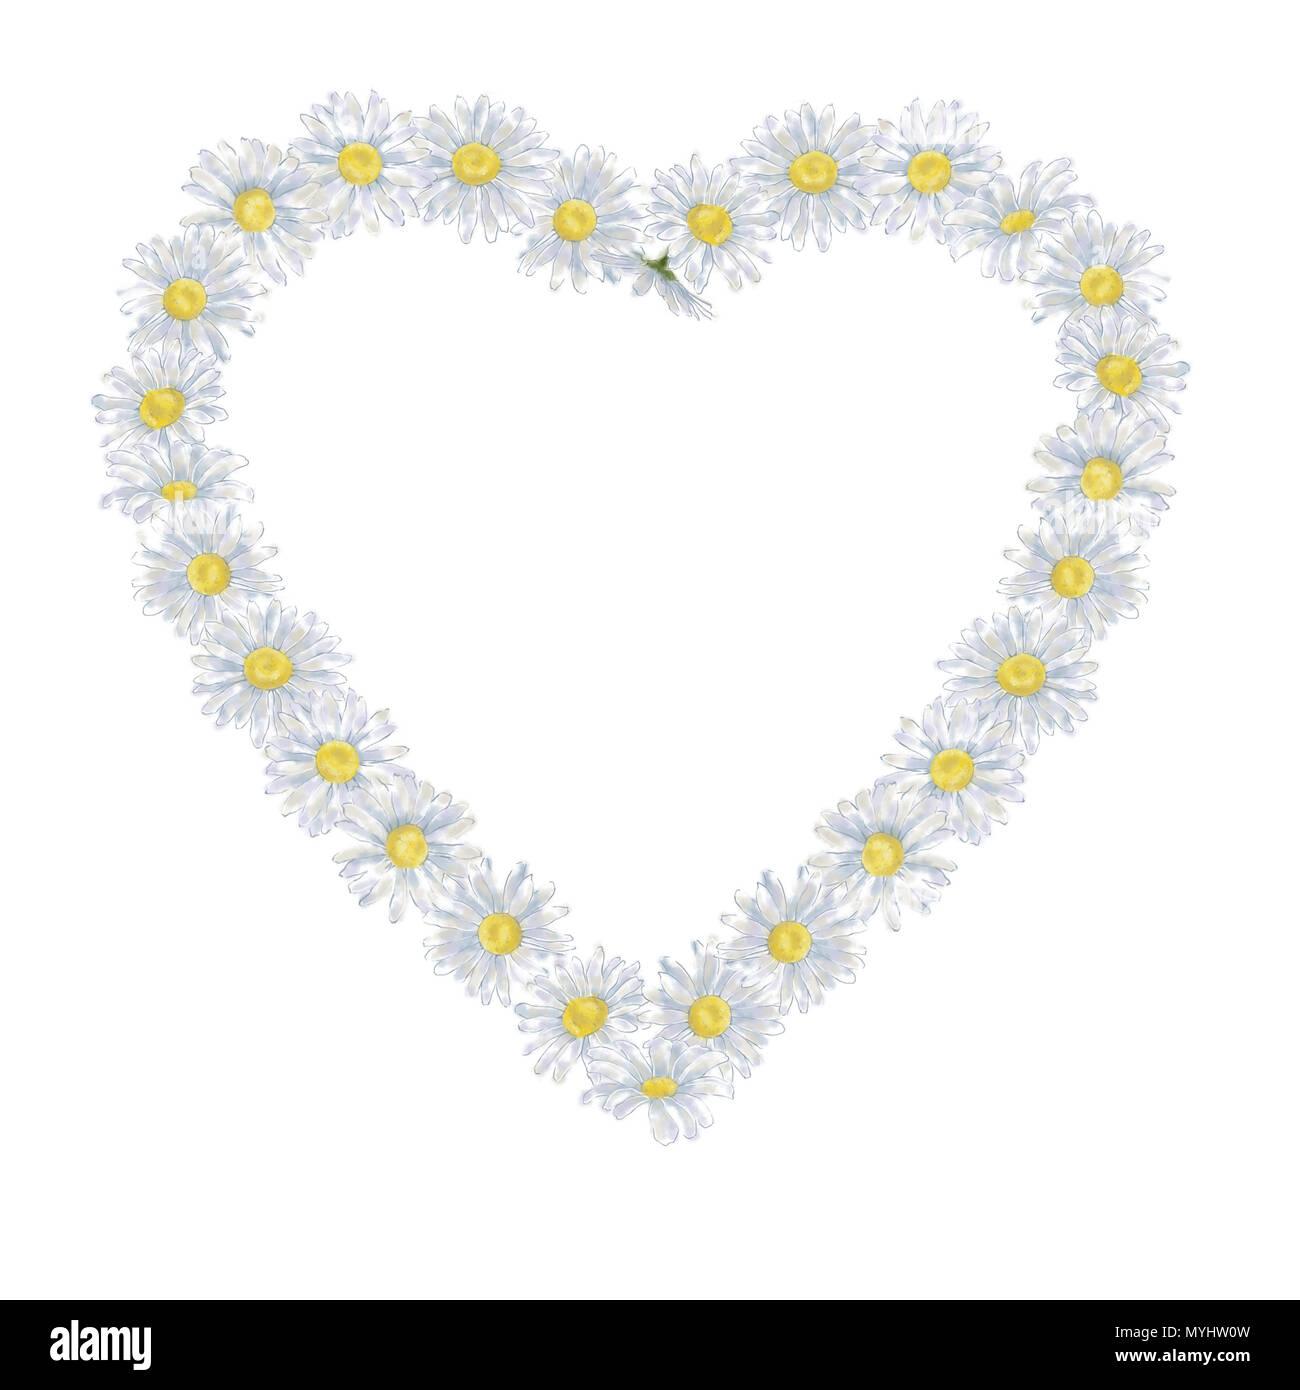 Margarita corona con forma de corazón aislado sobre fondo blanco ...